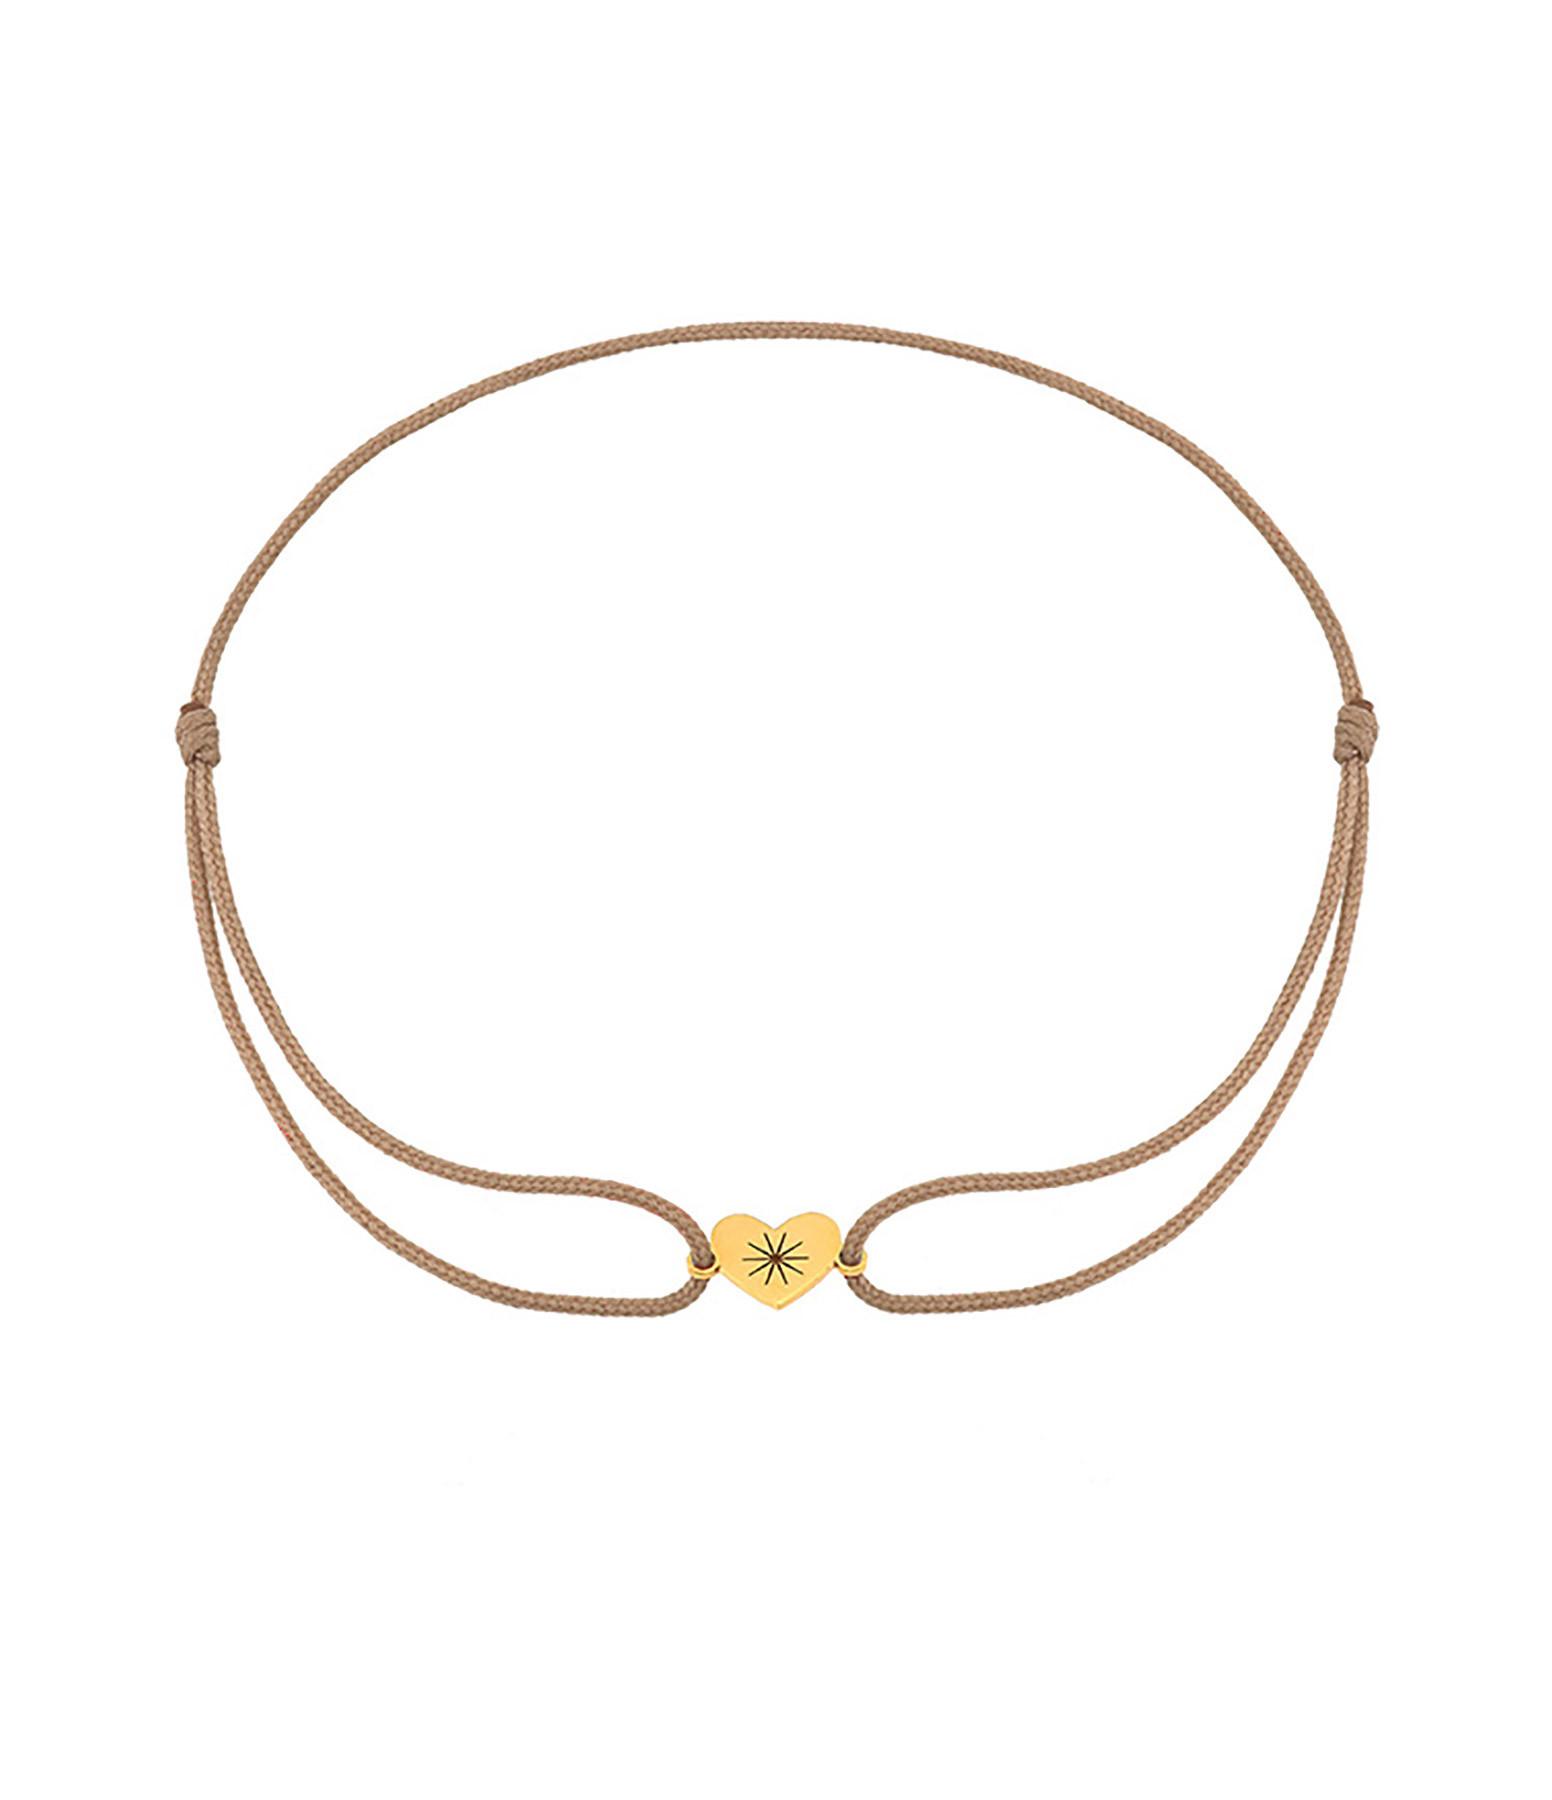 LA SUPERBE - Bracelet Cordon Cœur Or Jaune Beige